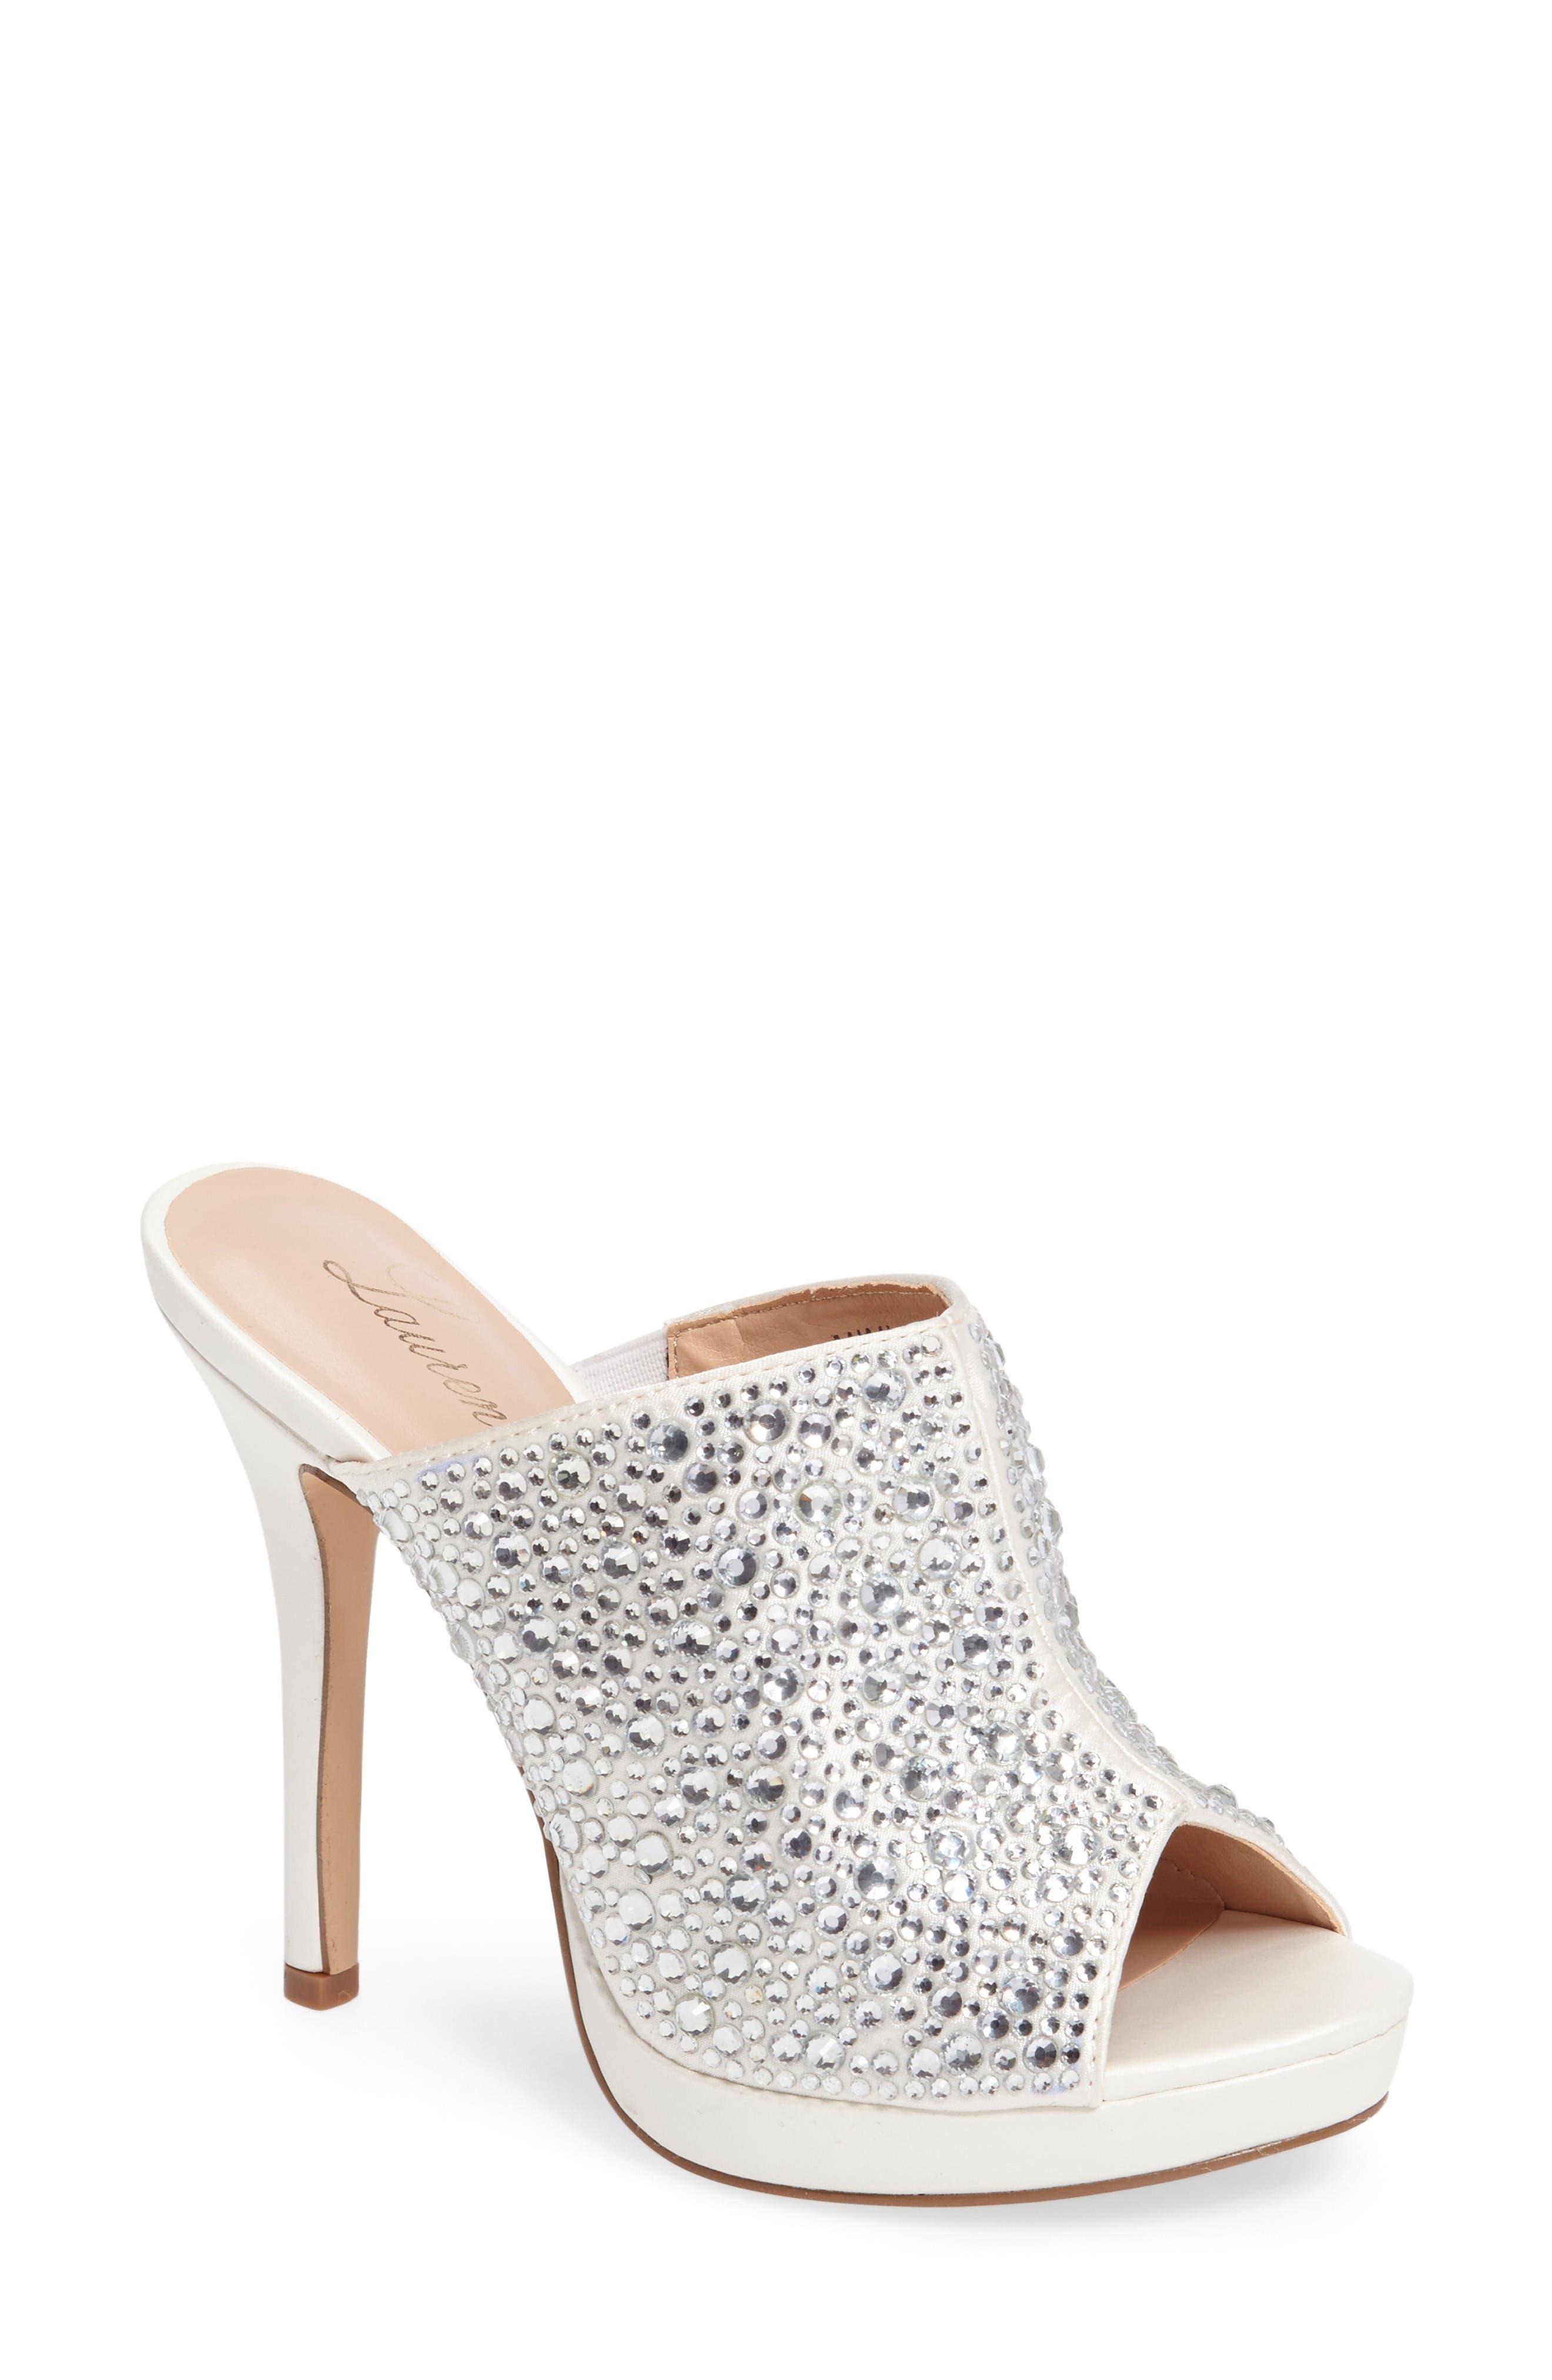 Alternate Image 1 Selected - Lauren Lorraine Mimi Embellished Slide Sandal (Women)